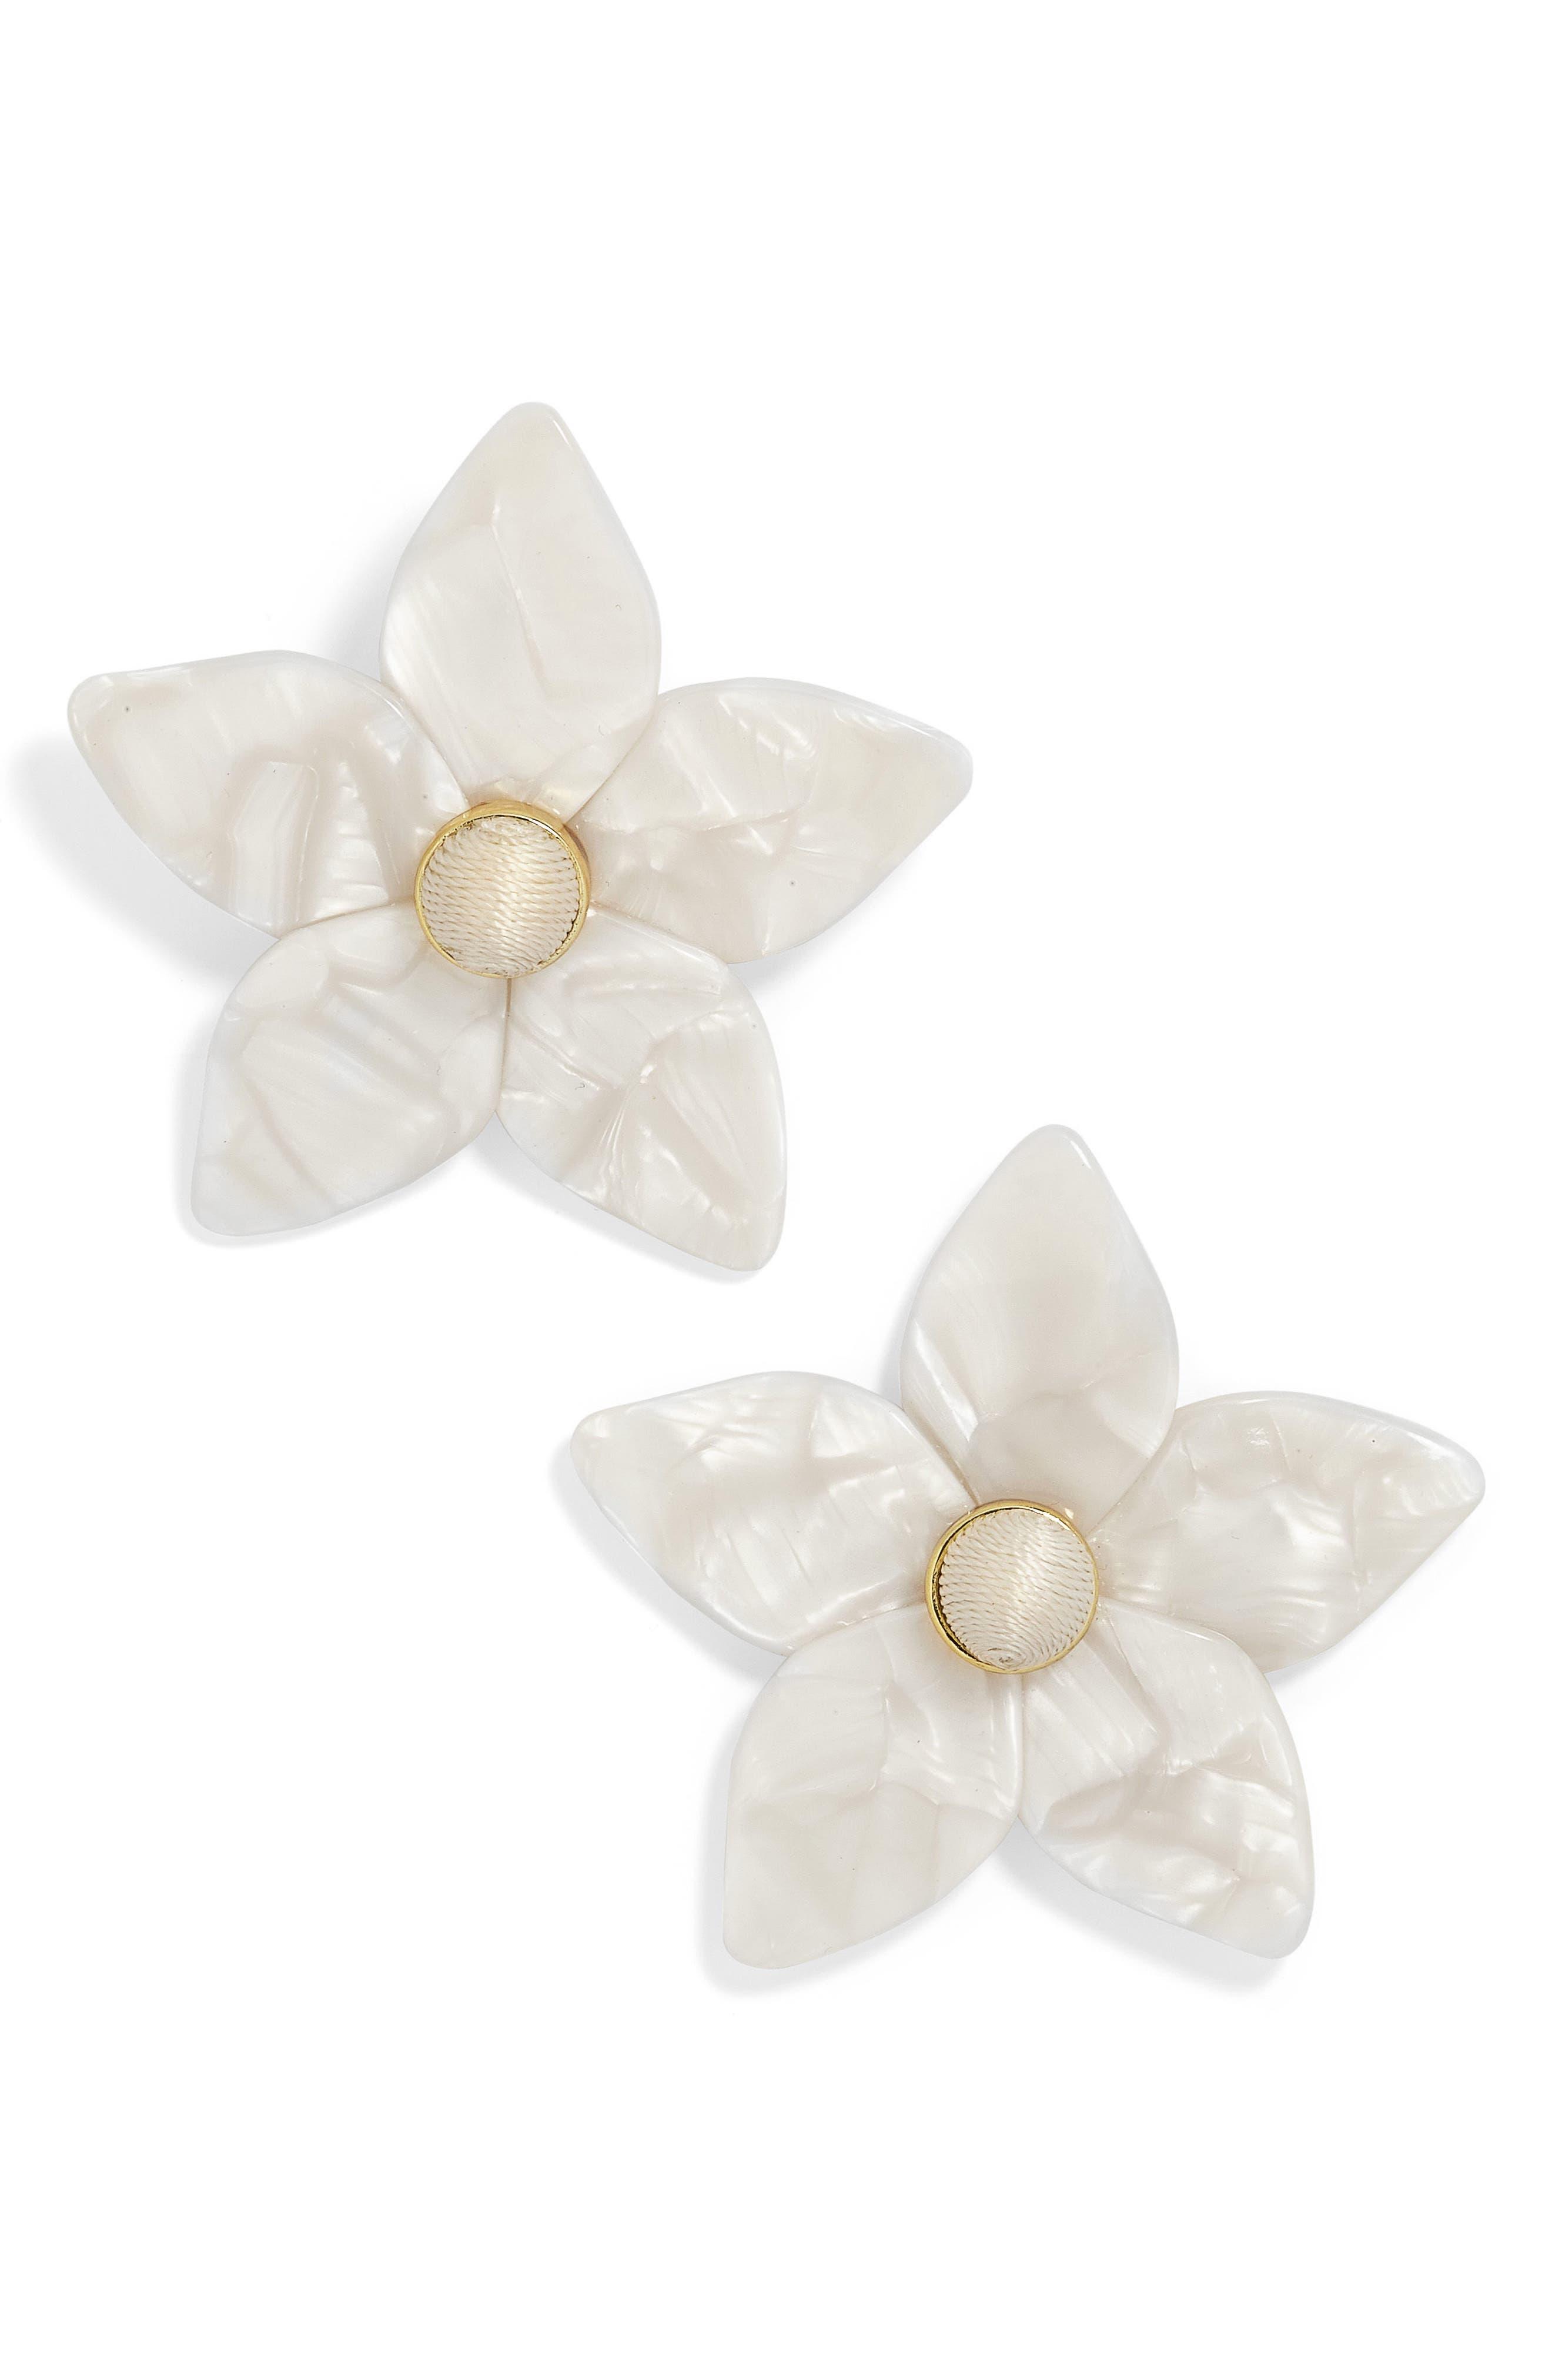 Amariella Acrylic Flower Stud Earrings,                         Main,                         color, White